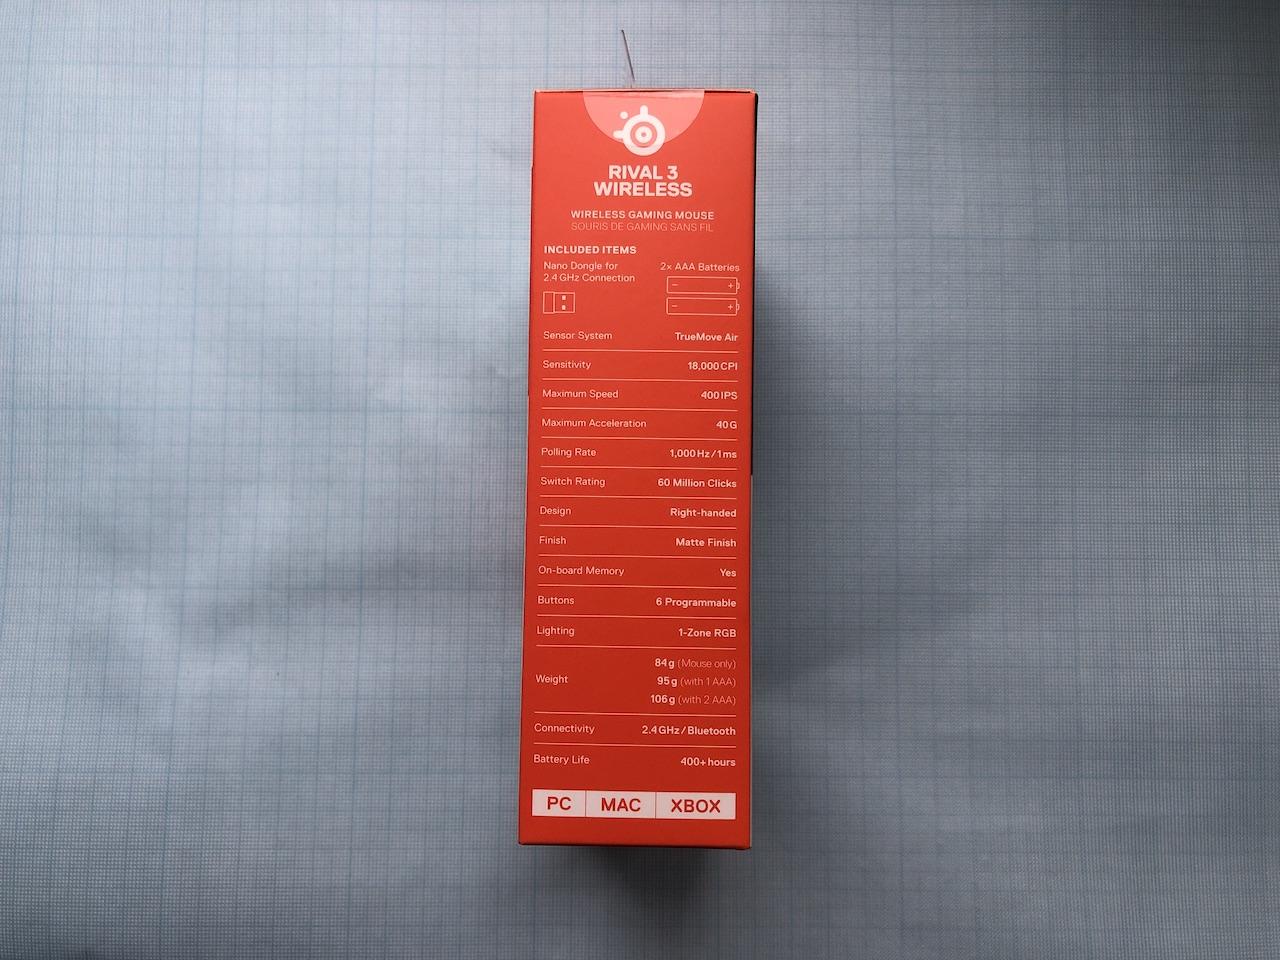 Обзор игровой мыши SteelSeries Rival 3 Wireless